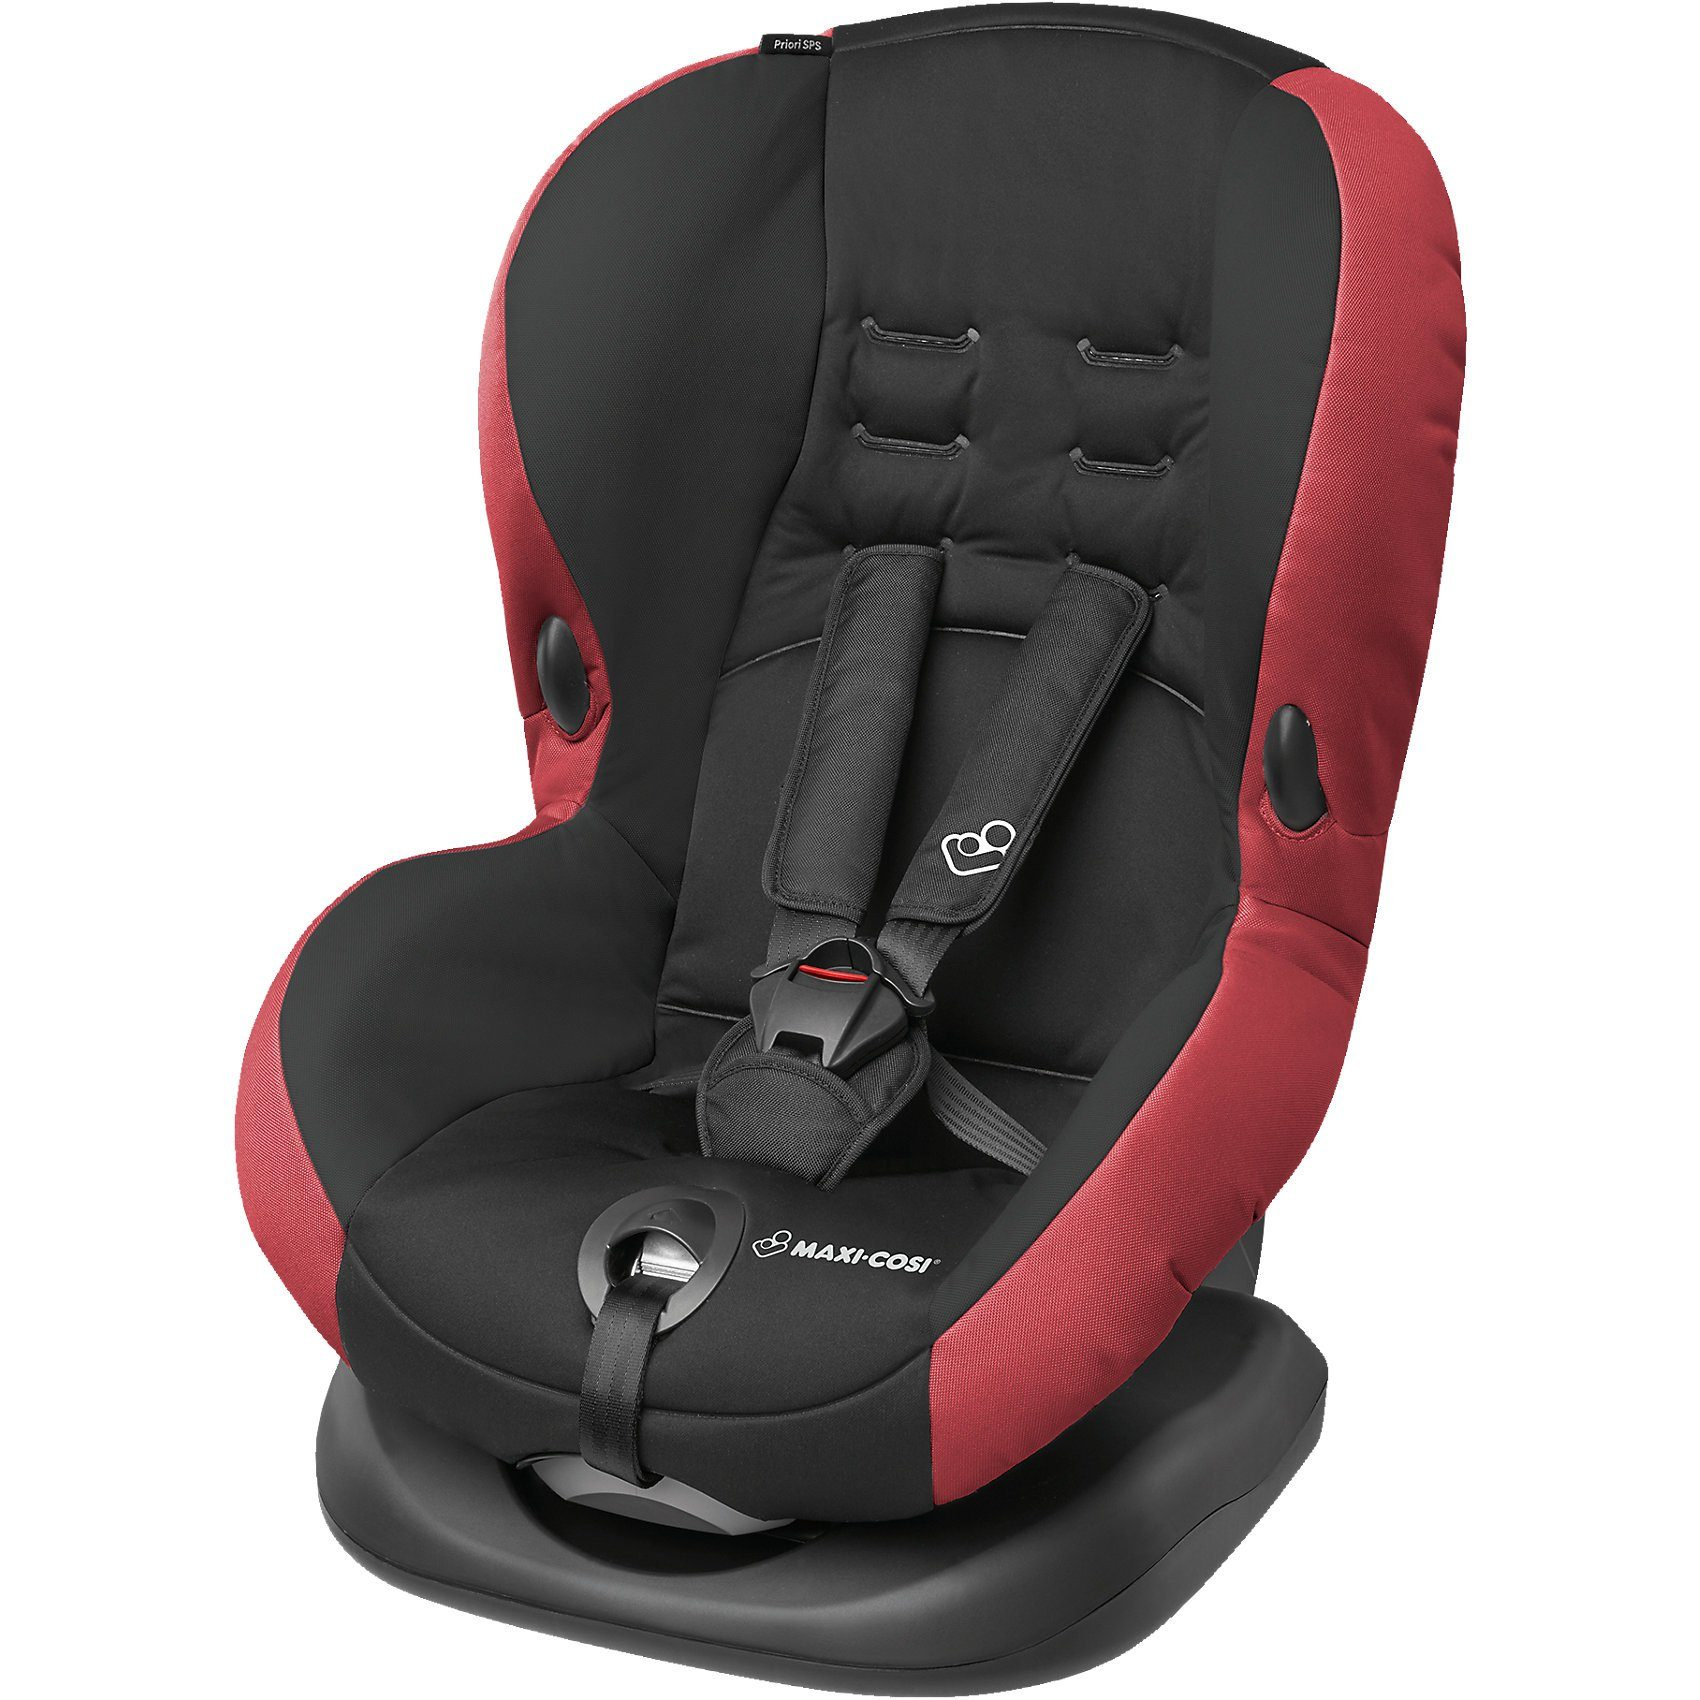 Maxi-Cosi Auto-Kindersitz Priori SPS+, Pepper Black, 2017